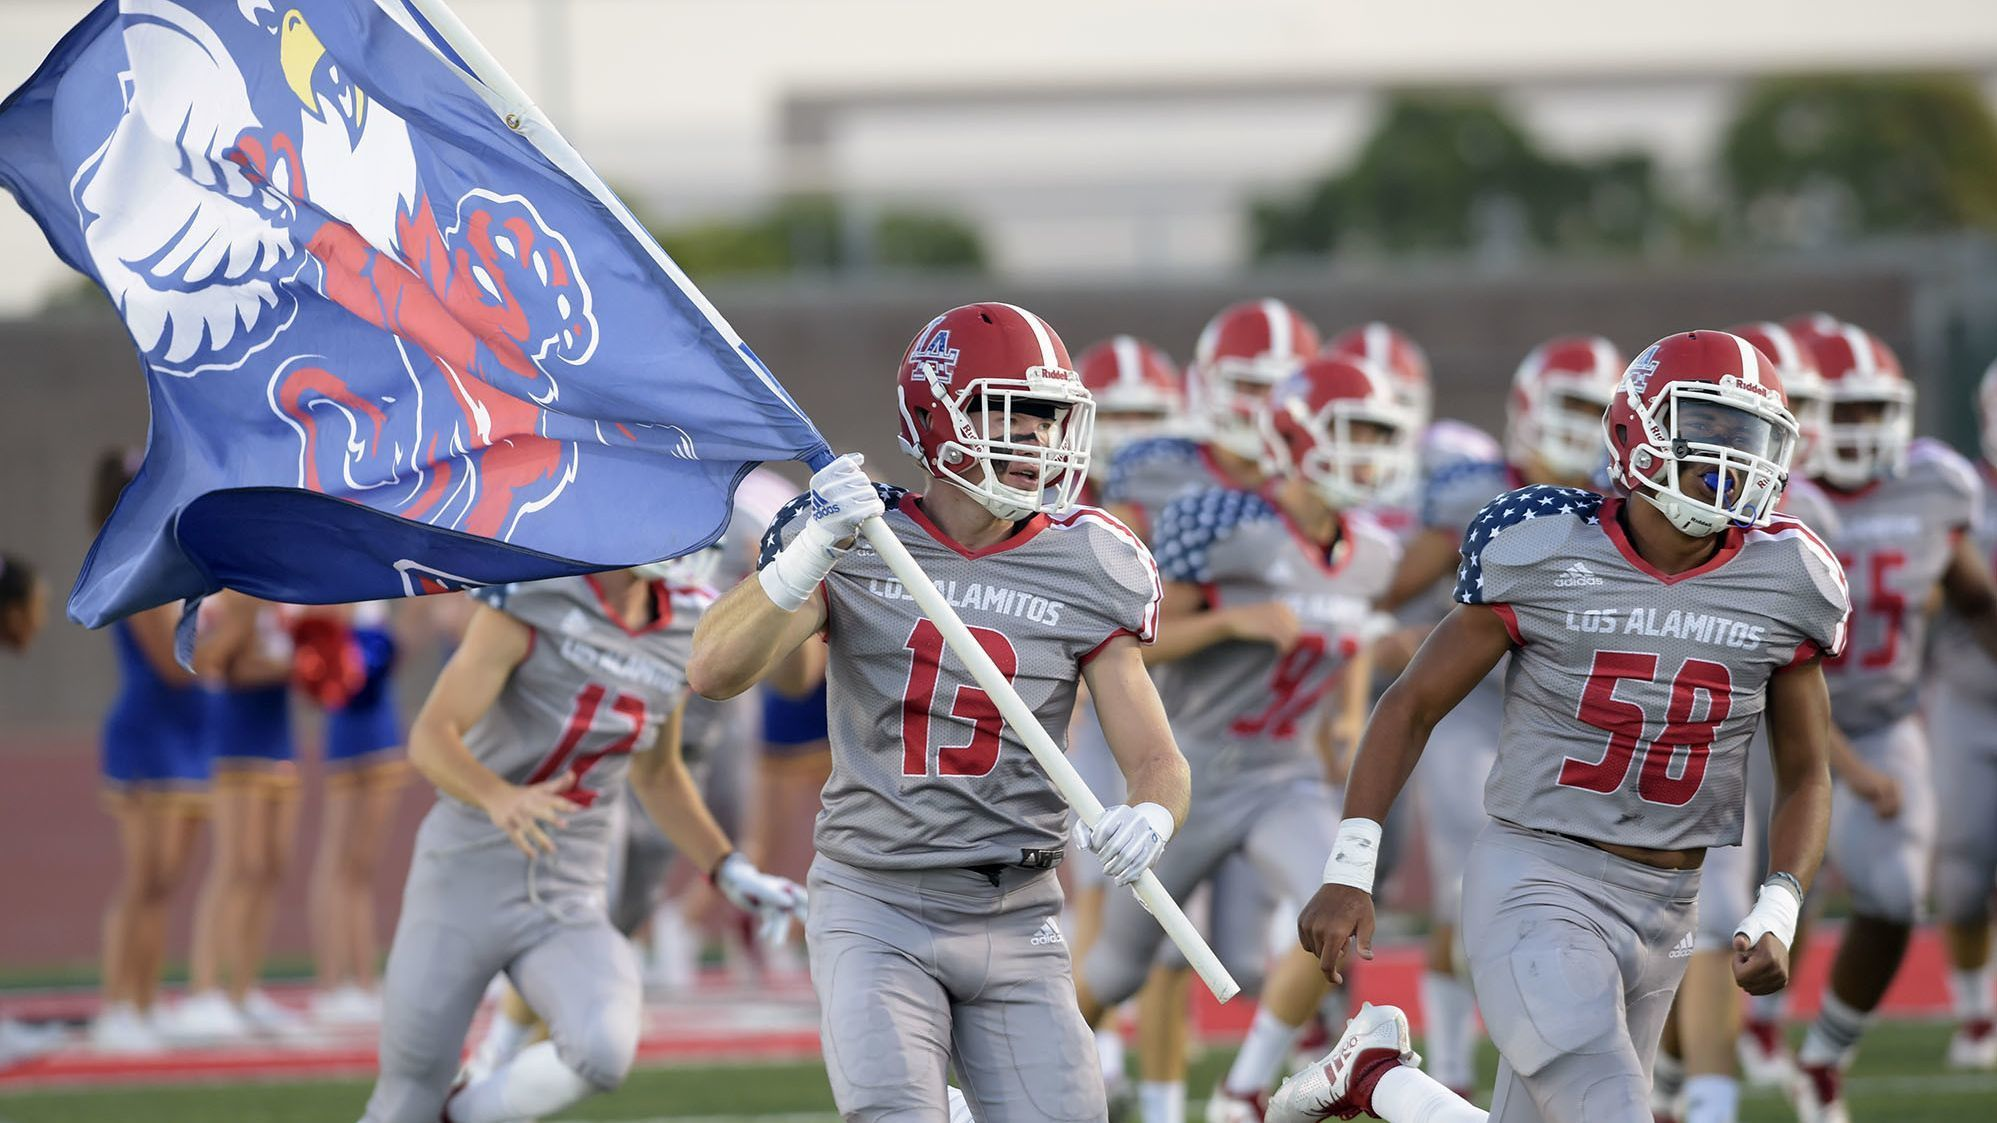 Week 10 High School Football Preview: Edison vs. Los Alamitos